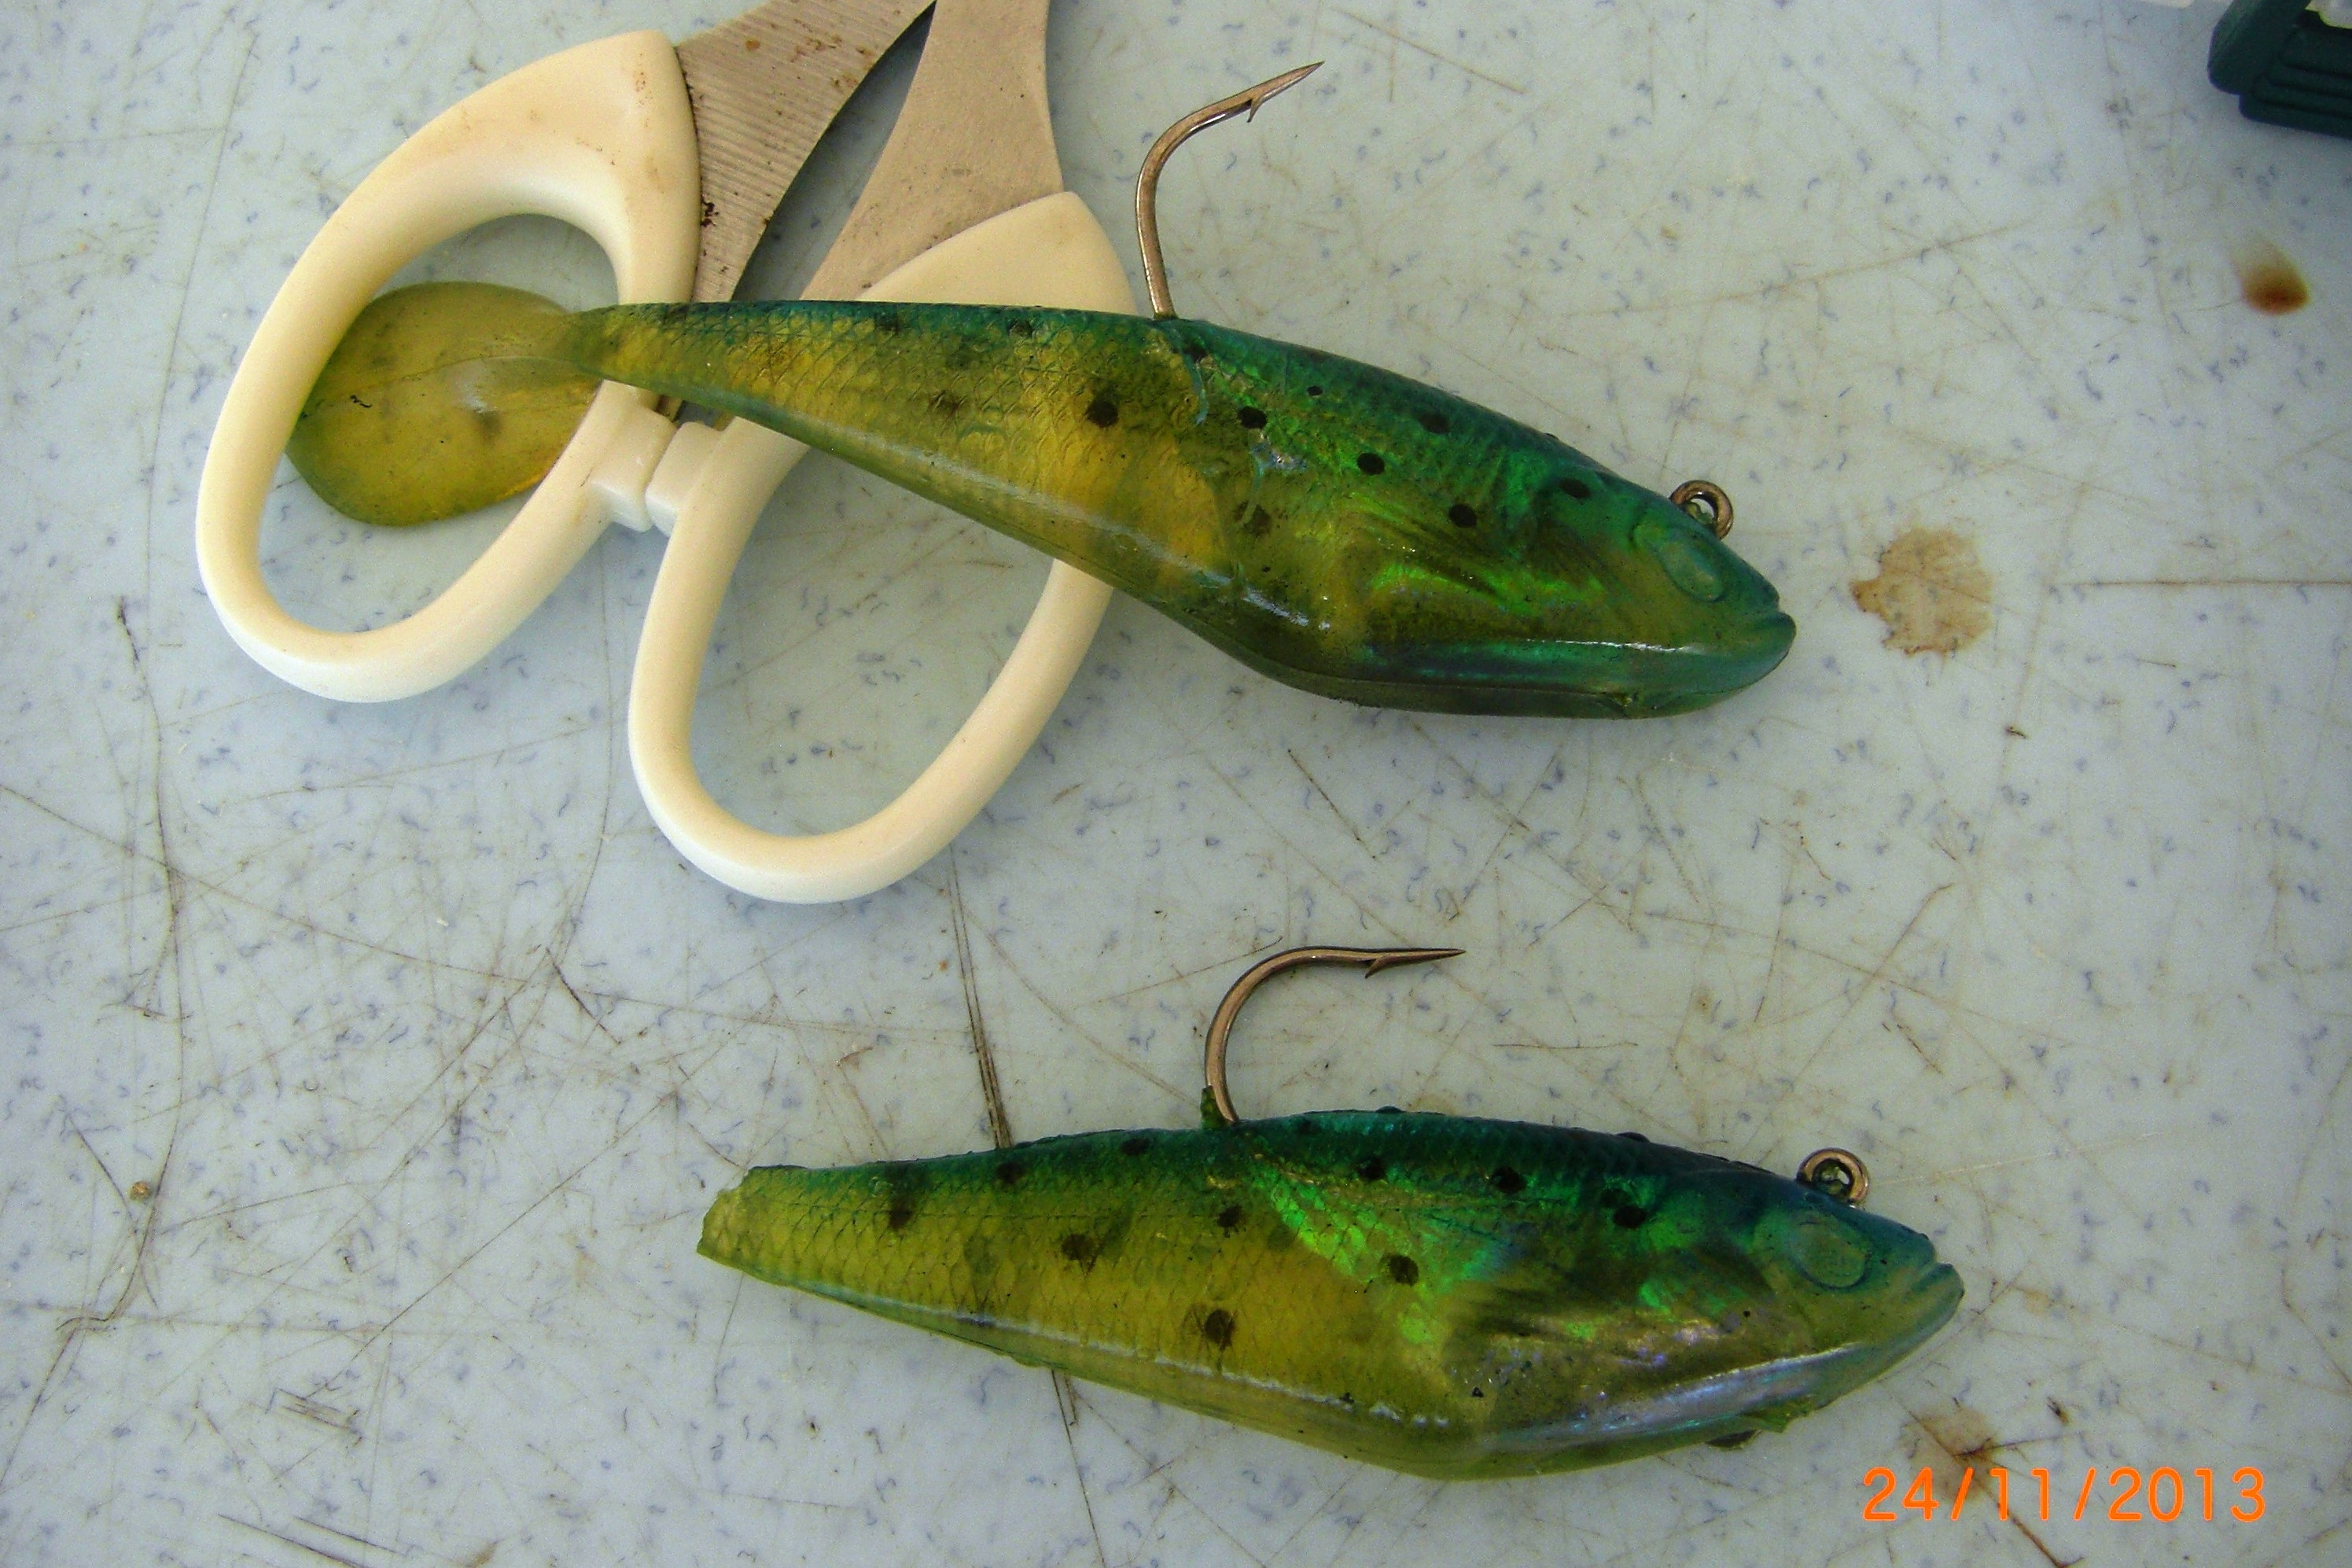 Neffp rawang andrew griffin sport fishing for Gar fishing lures